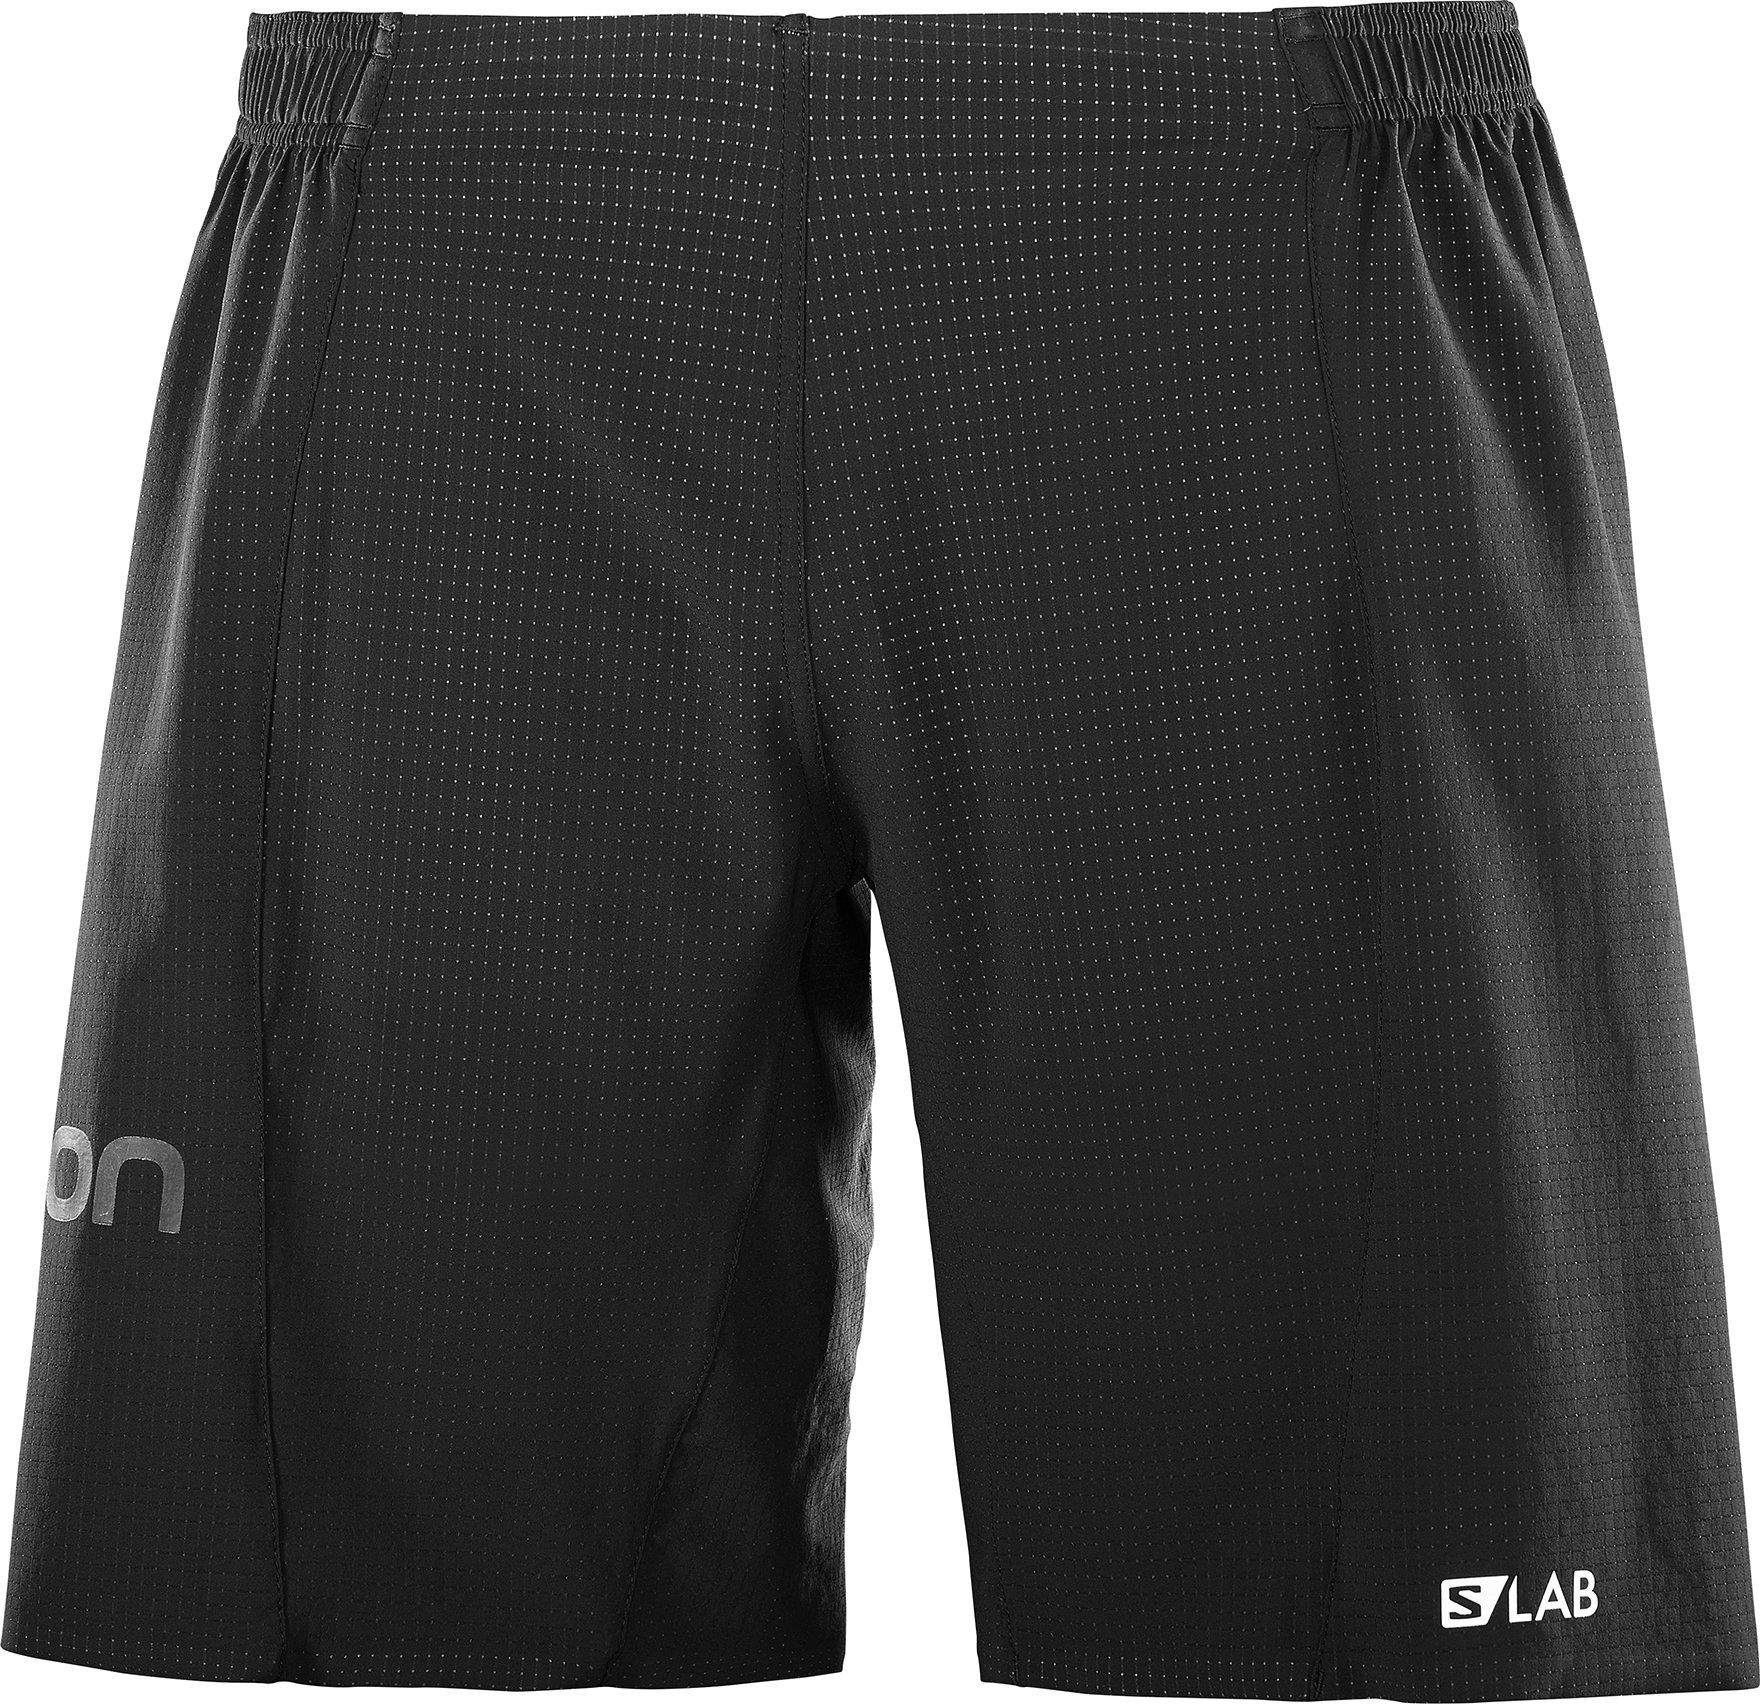 Salomon Men's S-Lab 9'' Shorts, Black, M